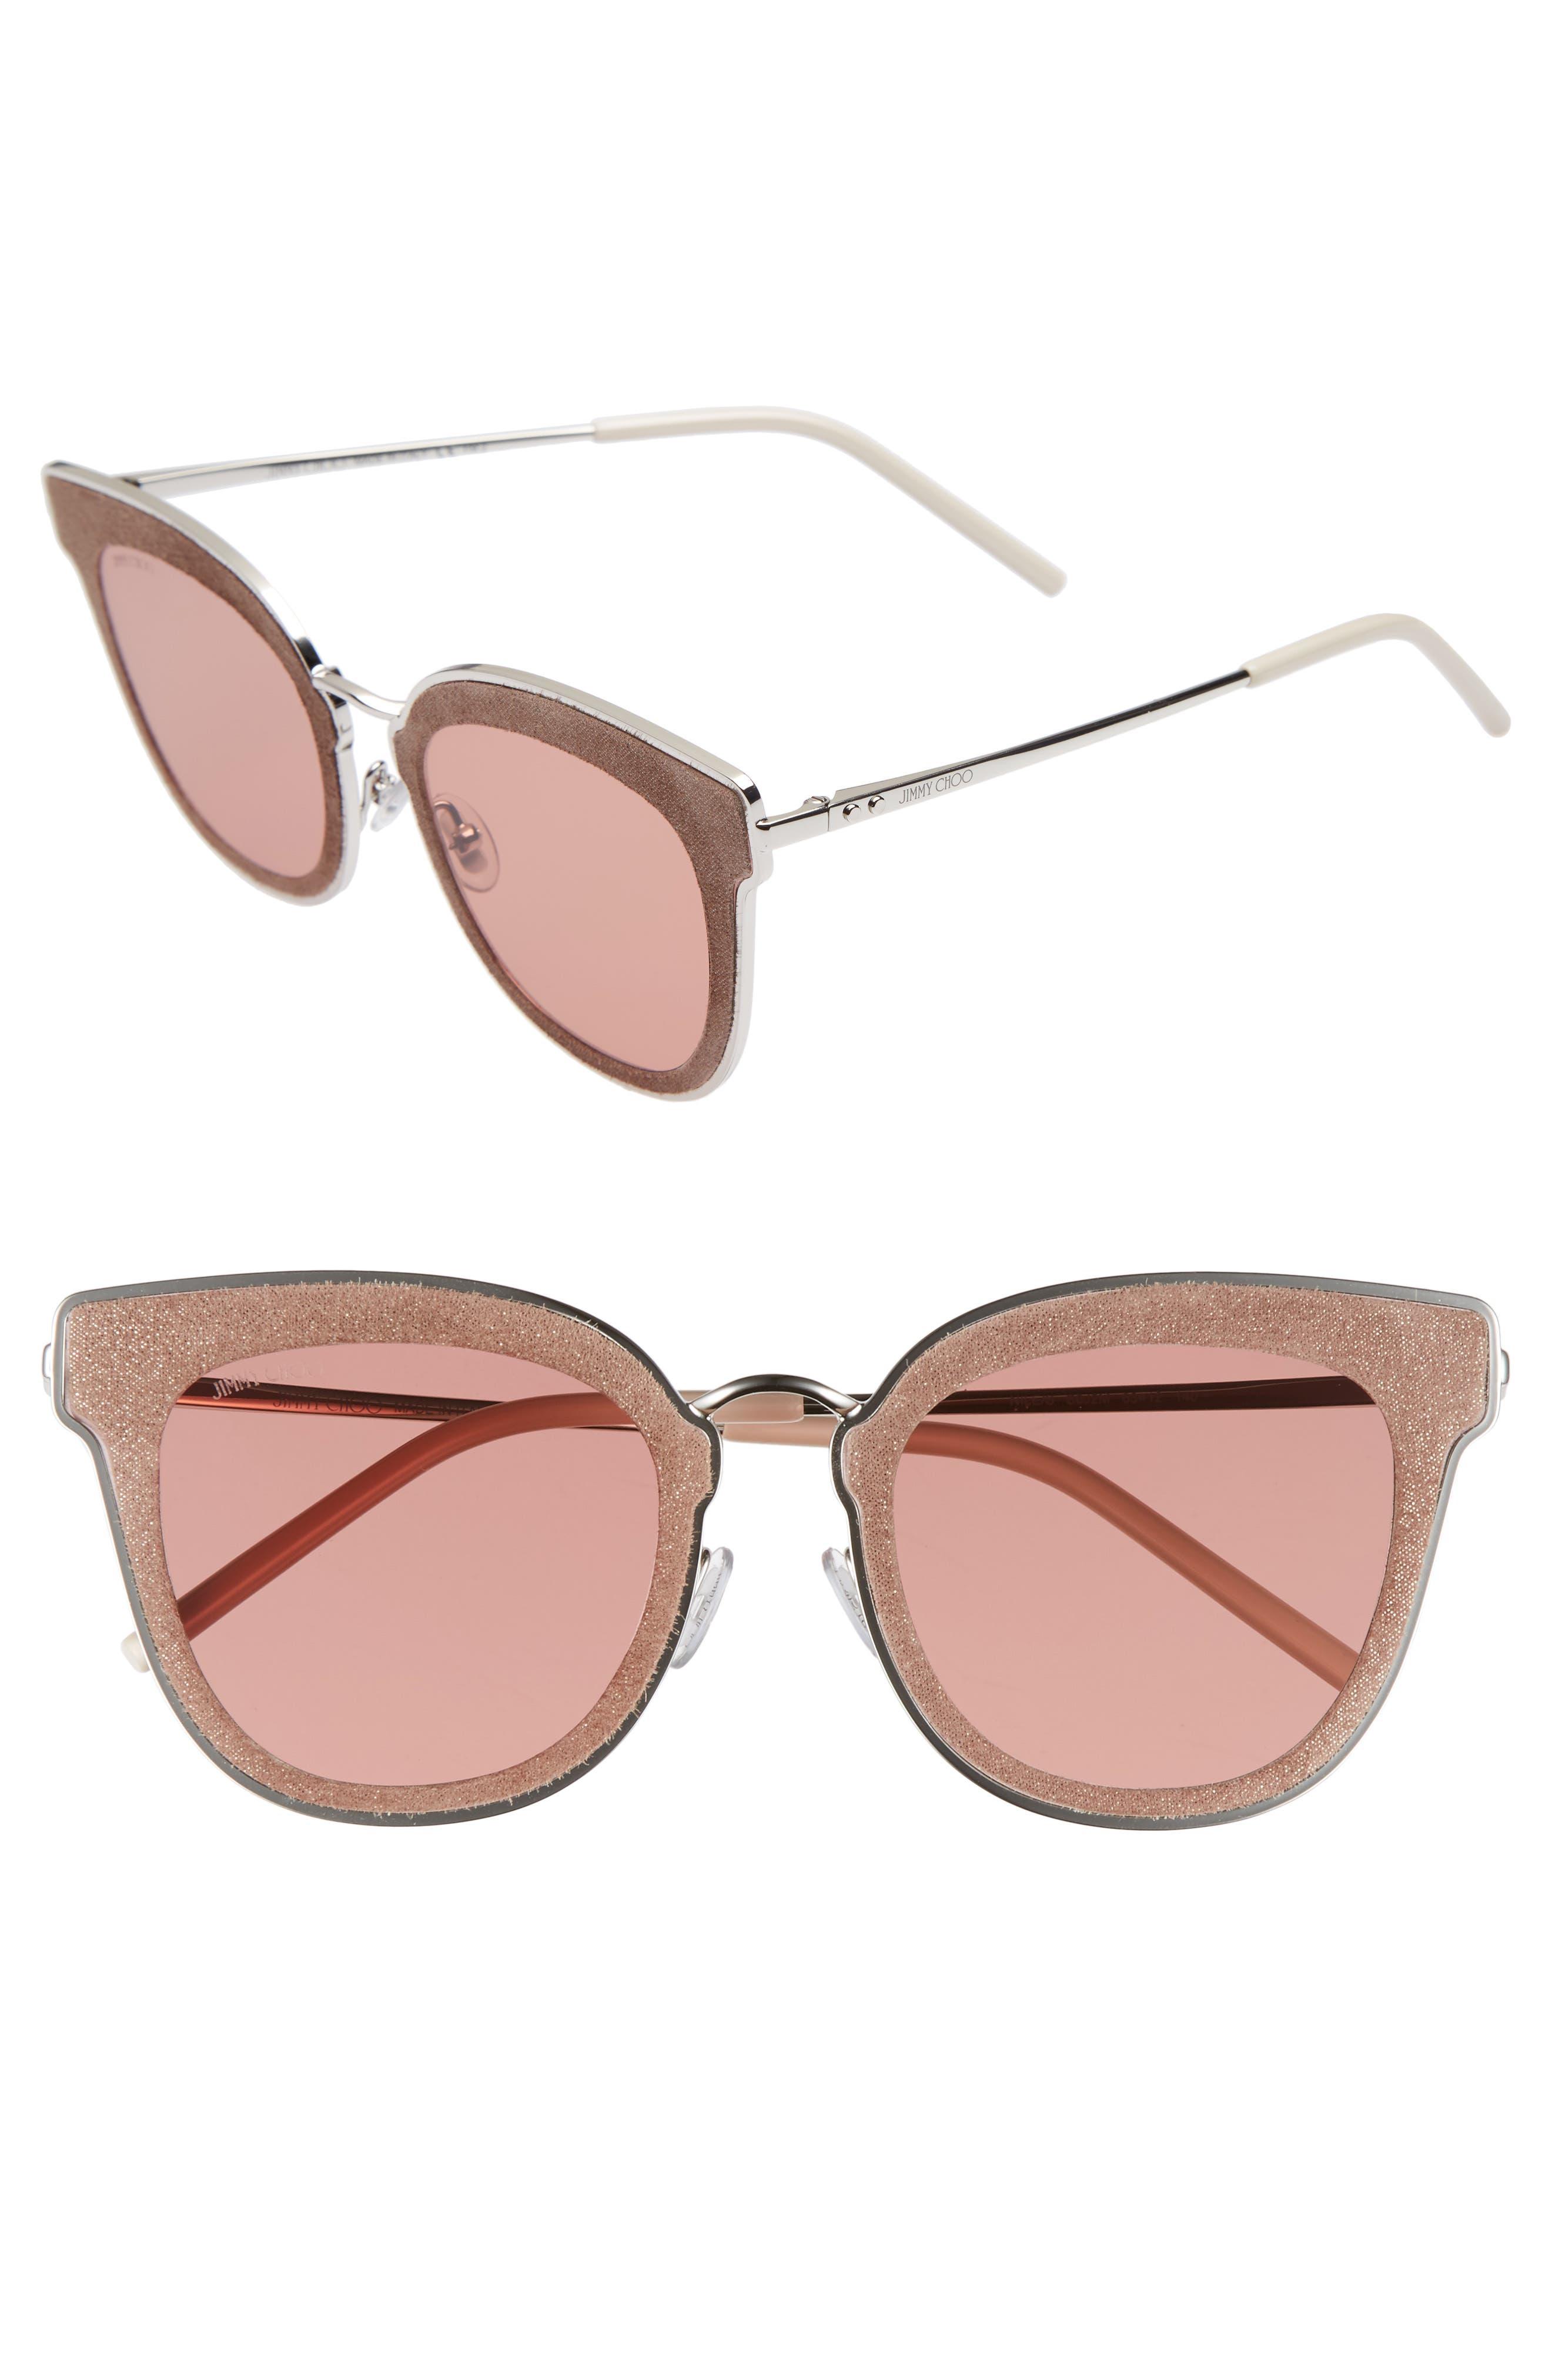 Niles 63mm Oversize Cat Eye Sunglasses,                         Main,                         color, Silver Beige